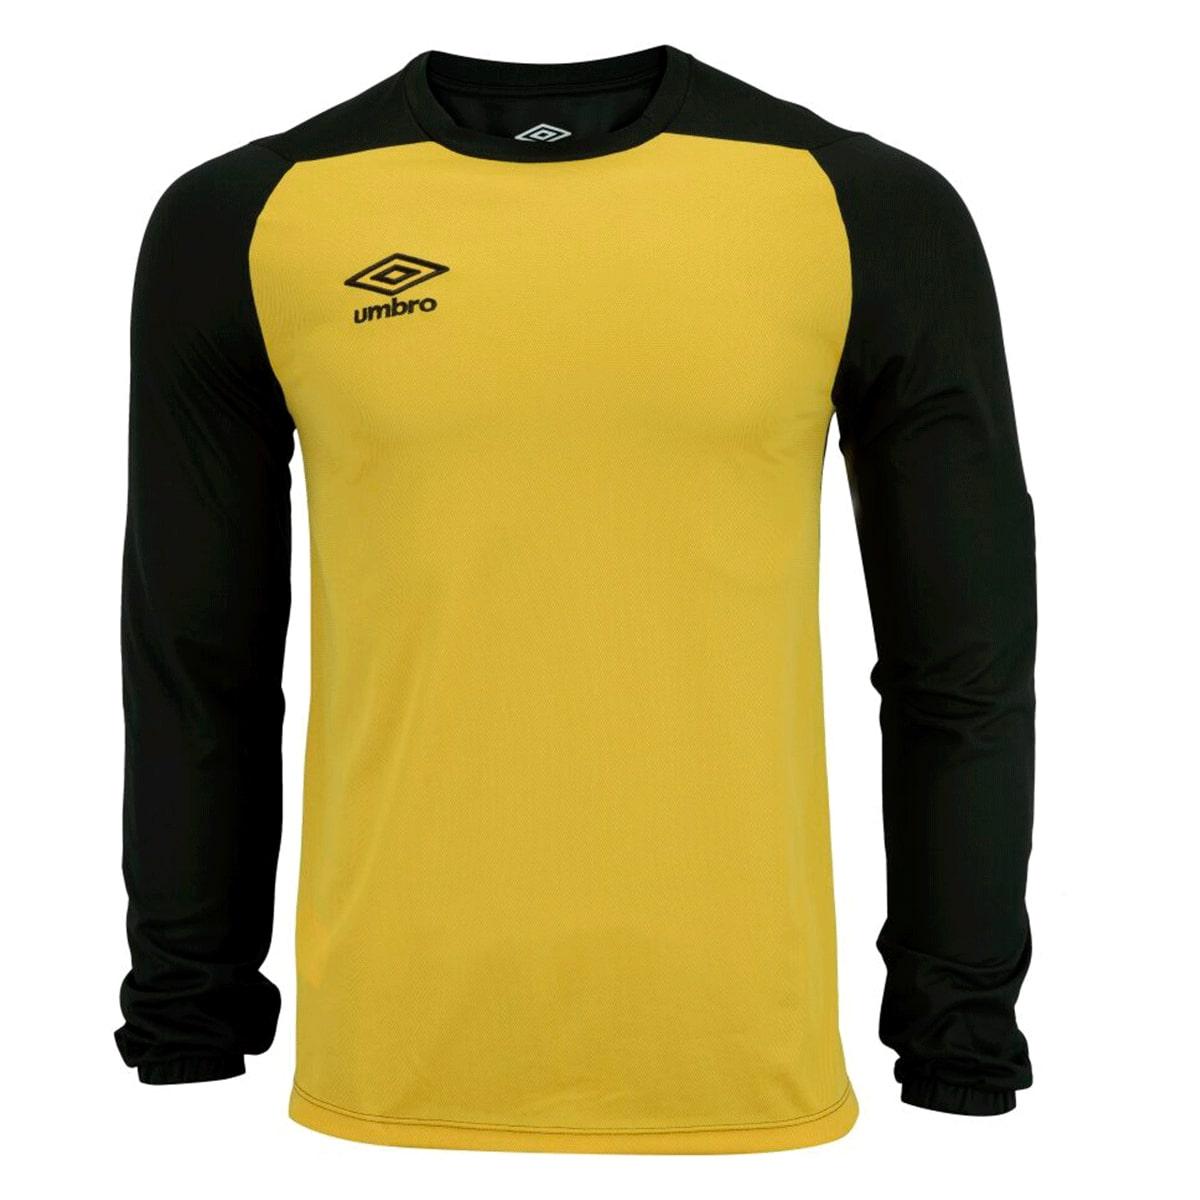 Camisa Umbro Goleiro ML Blast Amarelo Preto